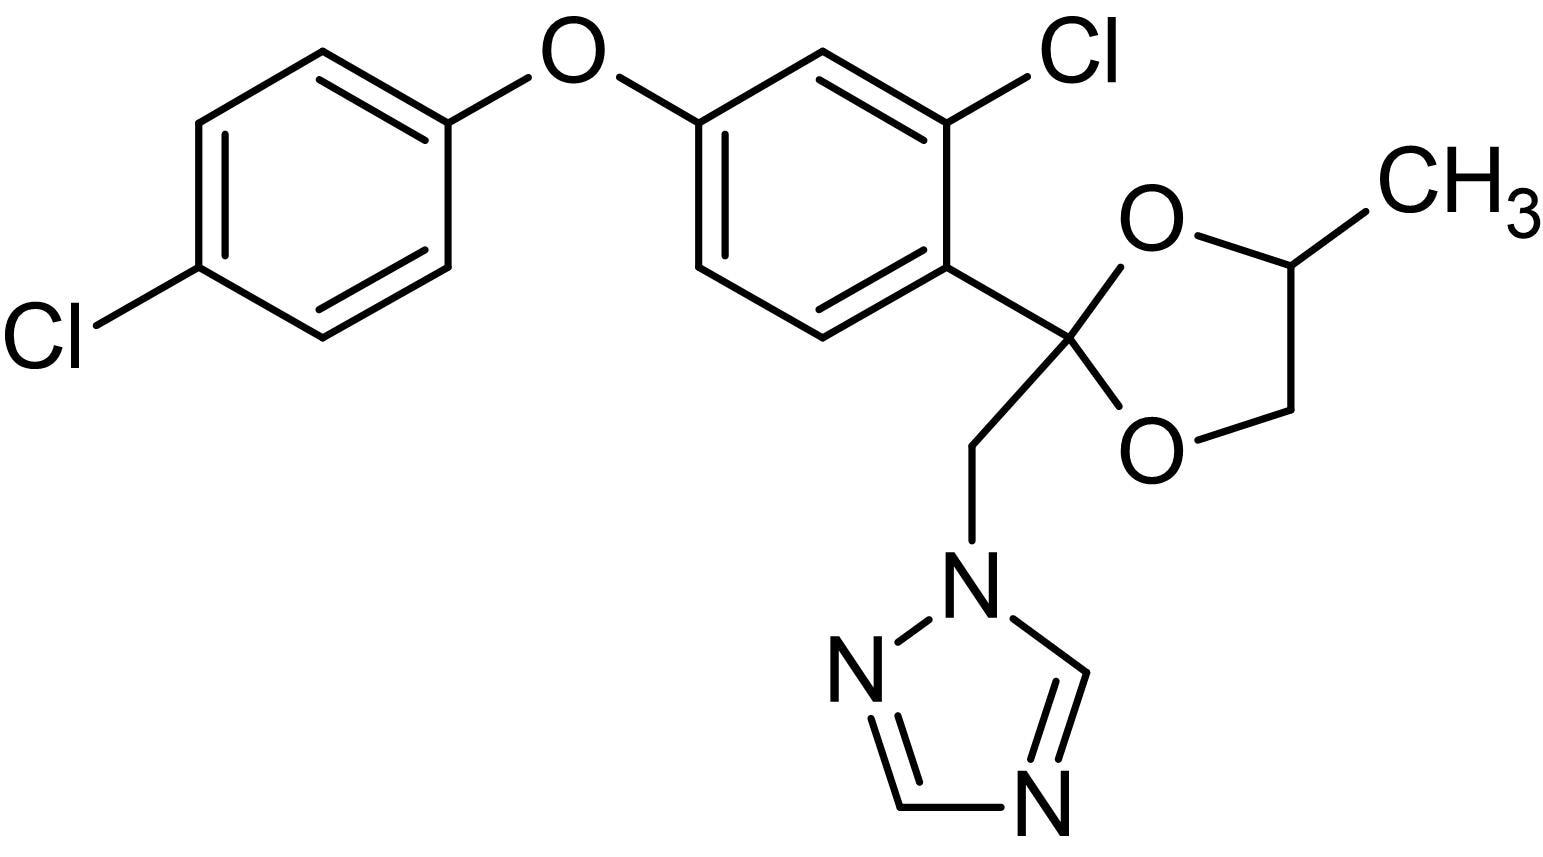 Chemical Structure - Difenoconazole, Plant fungicide (ab142287)